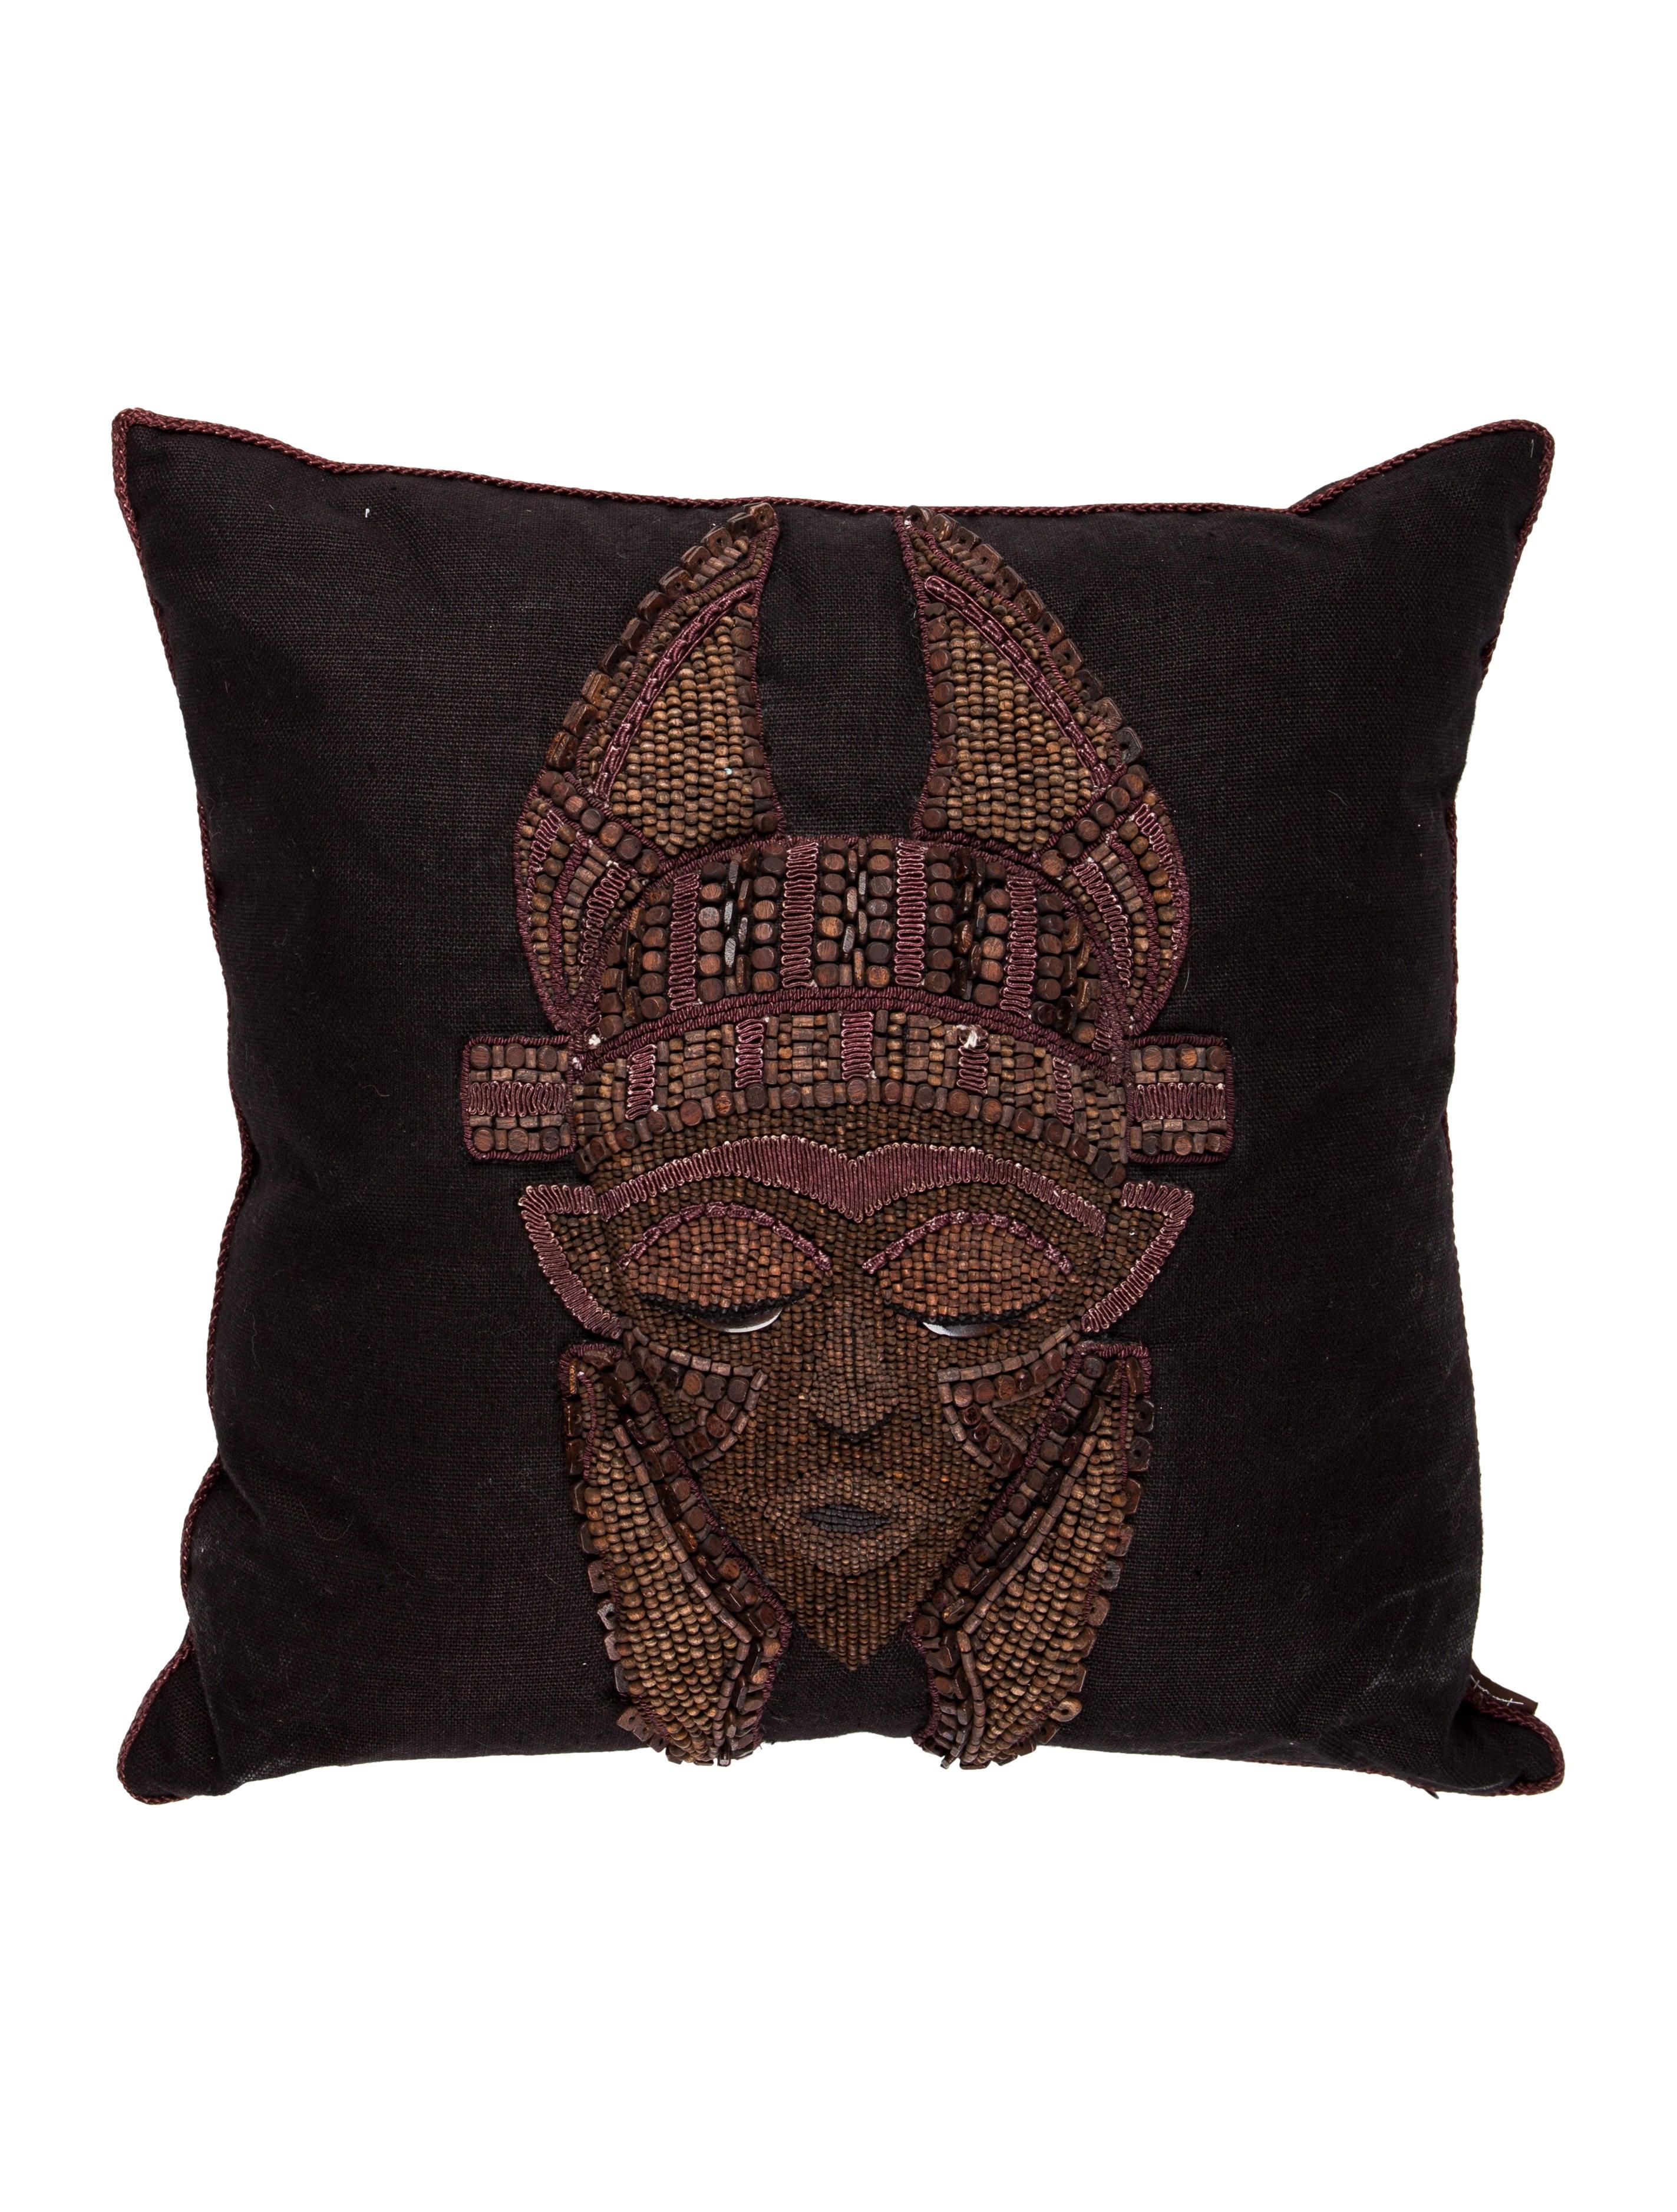 Ankasa Beaded Mask Throw Pillow - Pillows And Throws - ANKSA20031 The RealReal